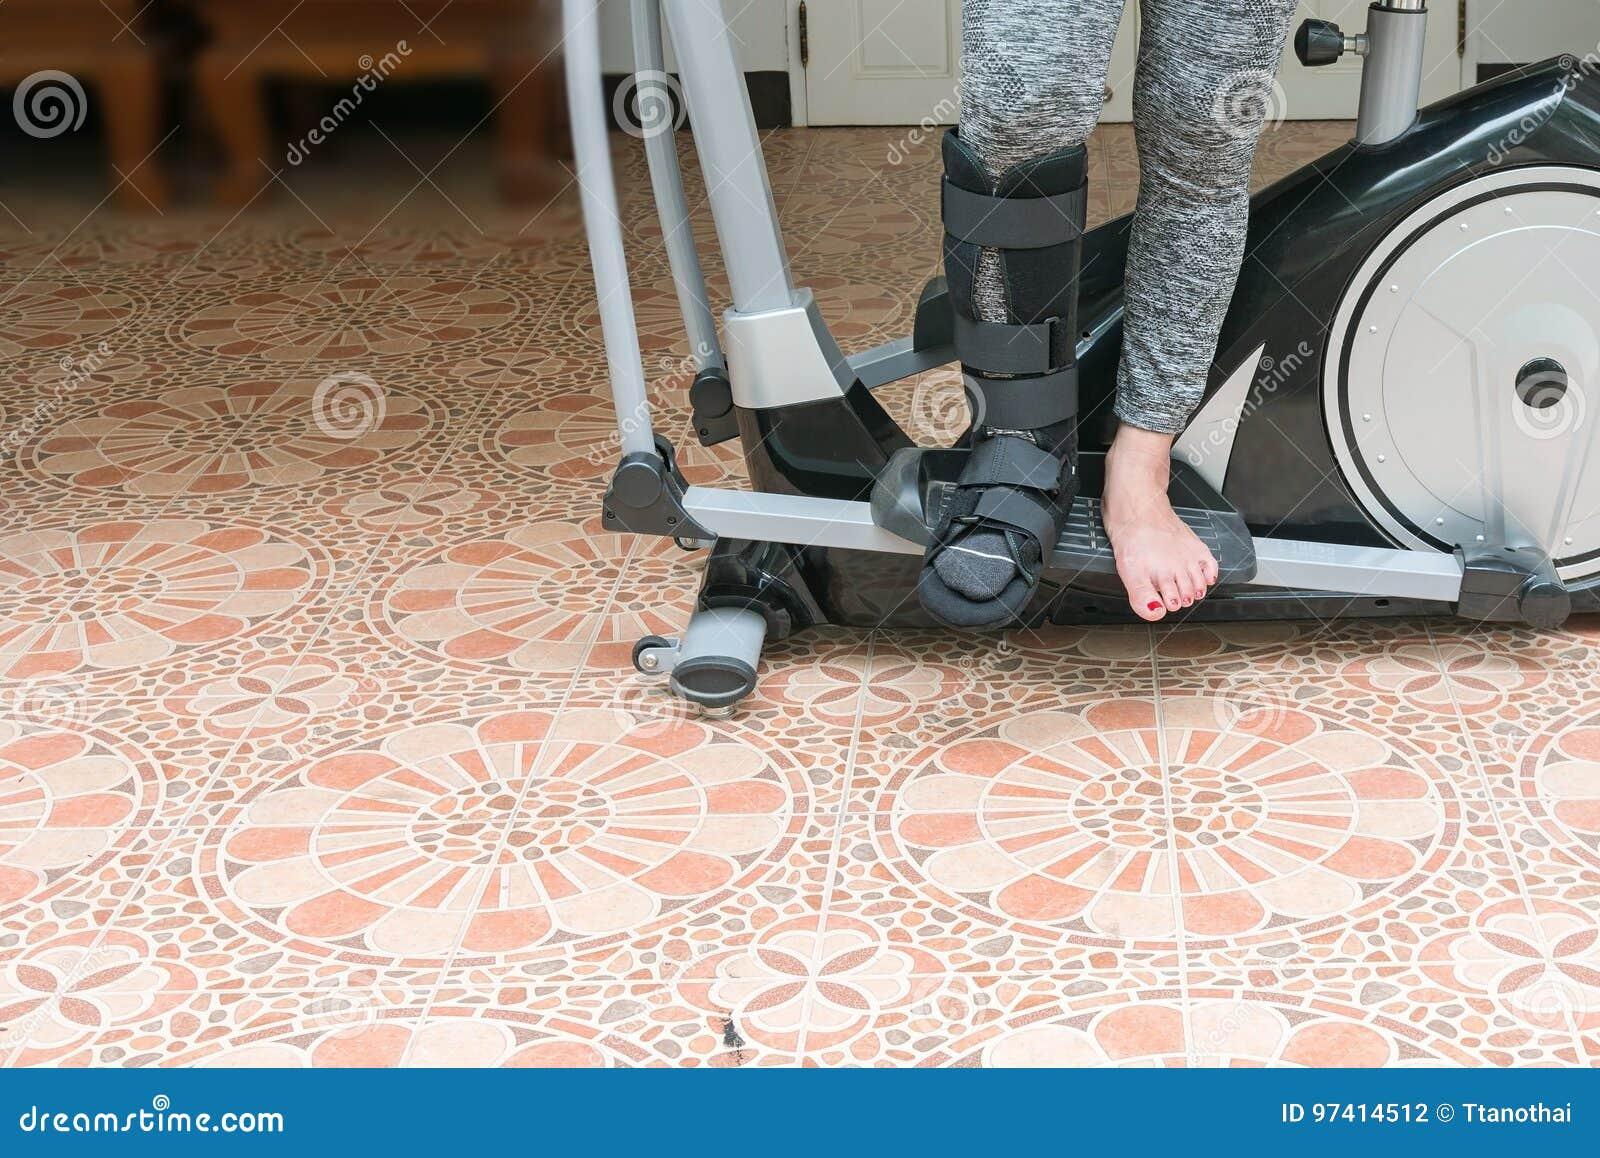 Broken Leg, Short Leg Cast, Splint For Treatment Of Injured